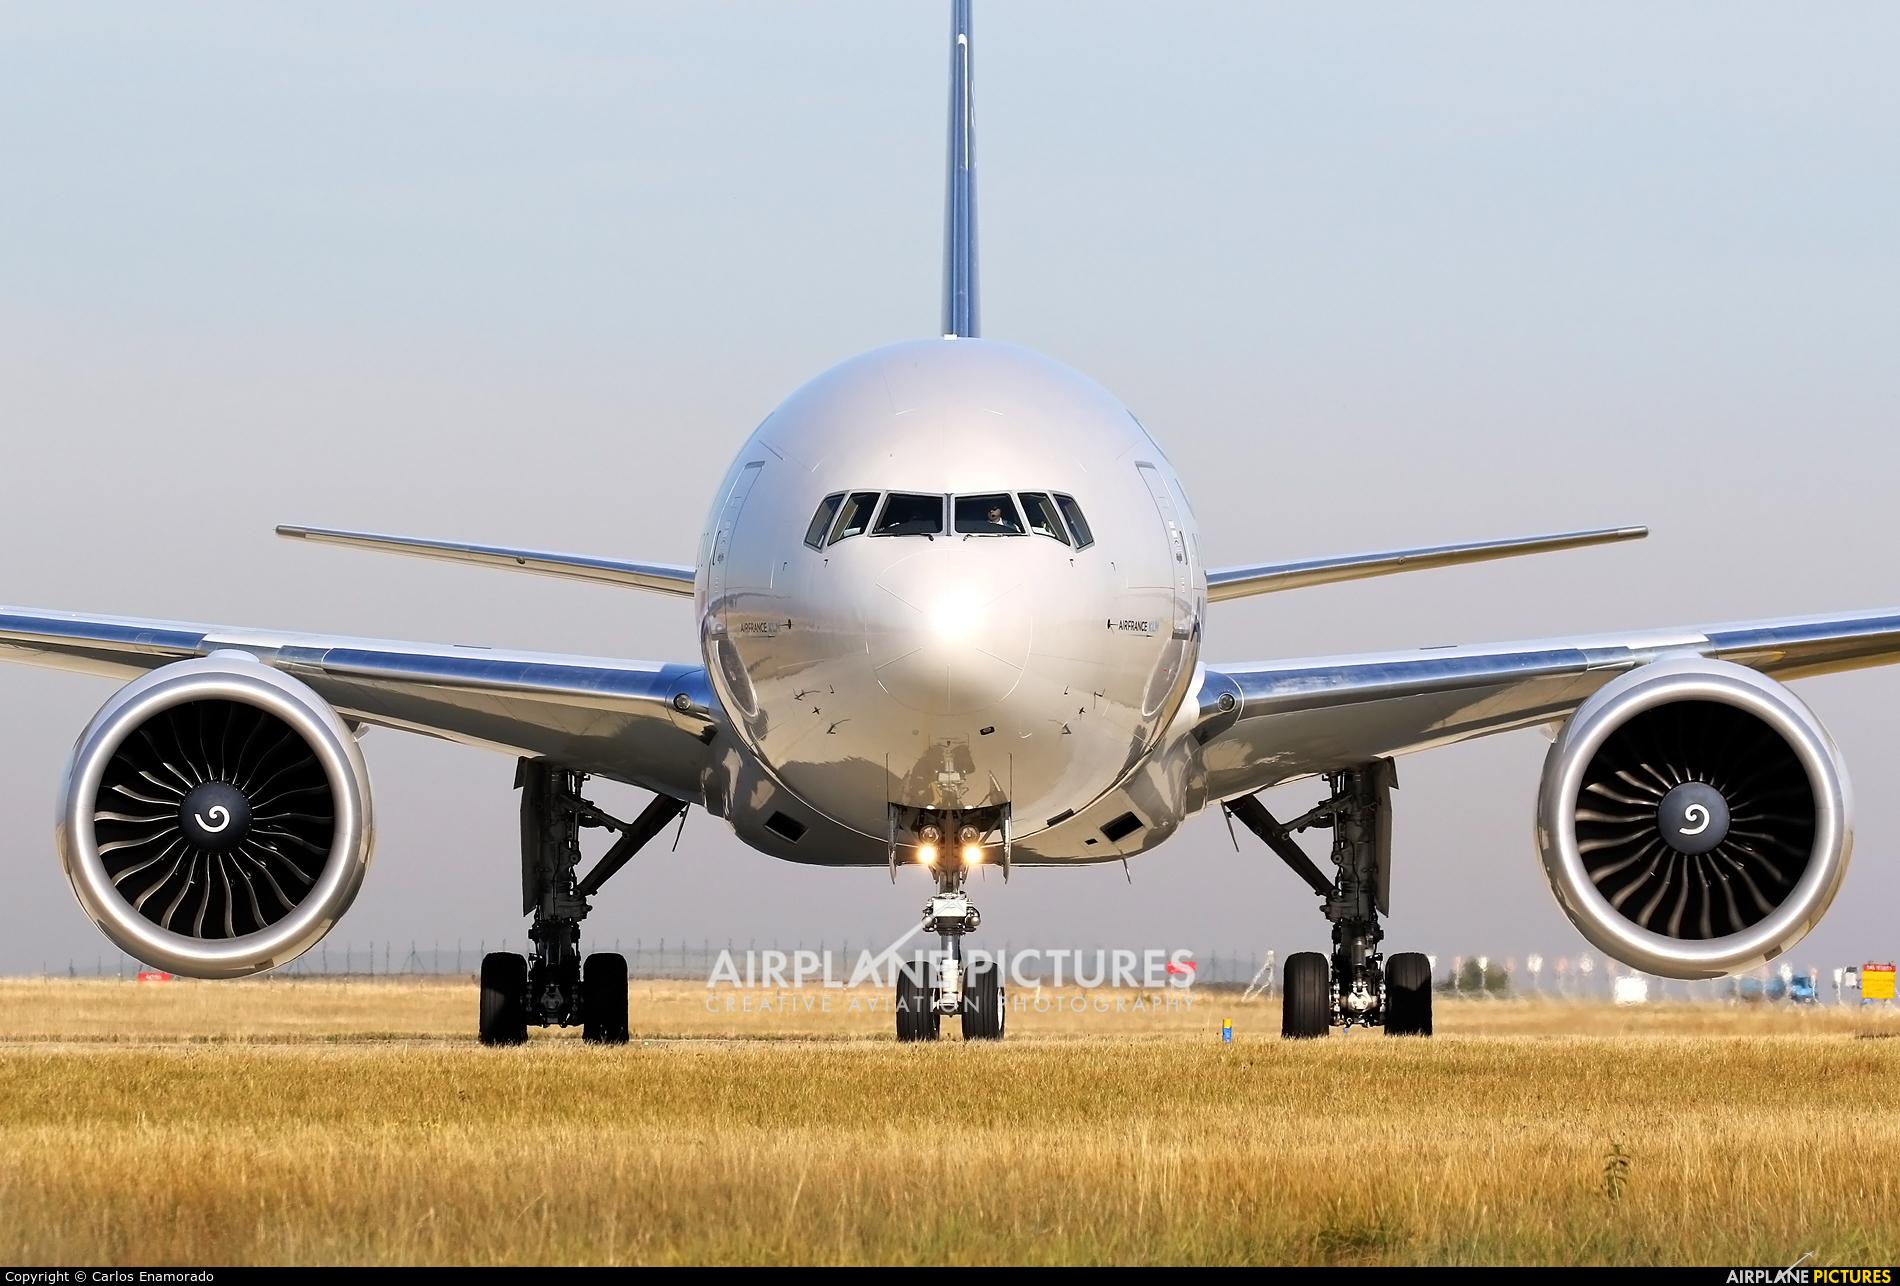 Air France F-GZNT aircraft at Paris - Charles de Gaulle